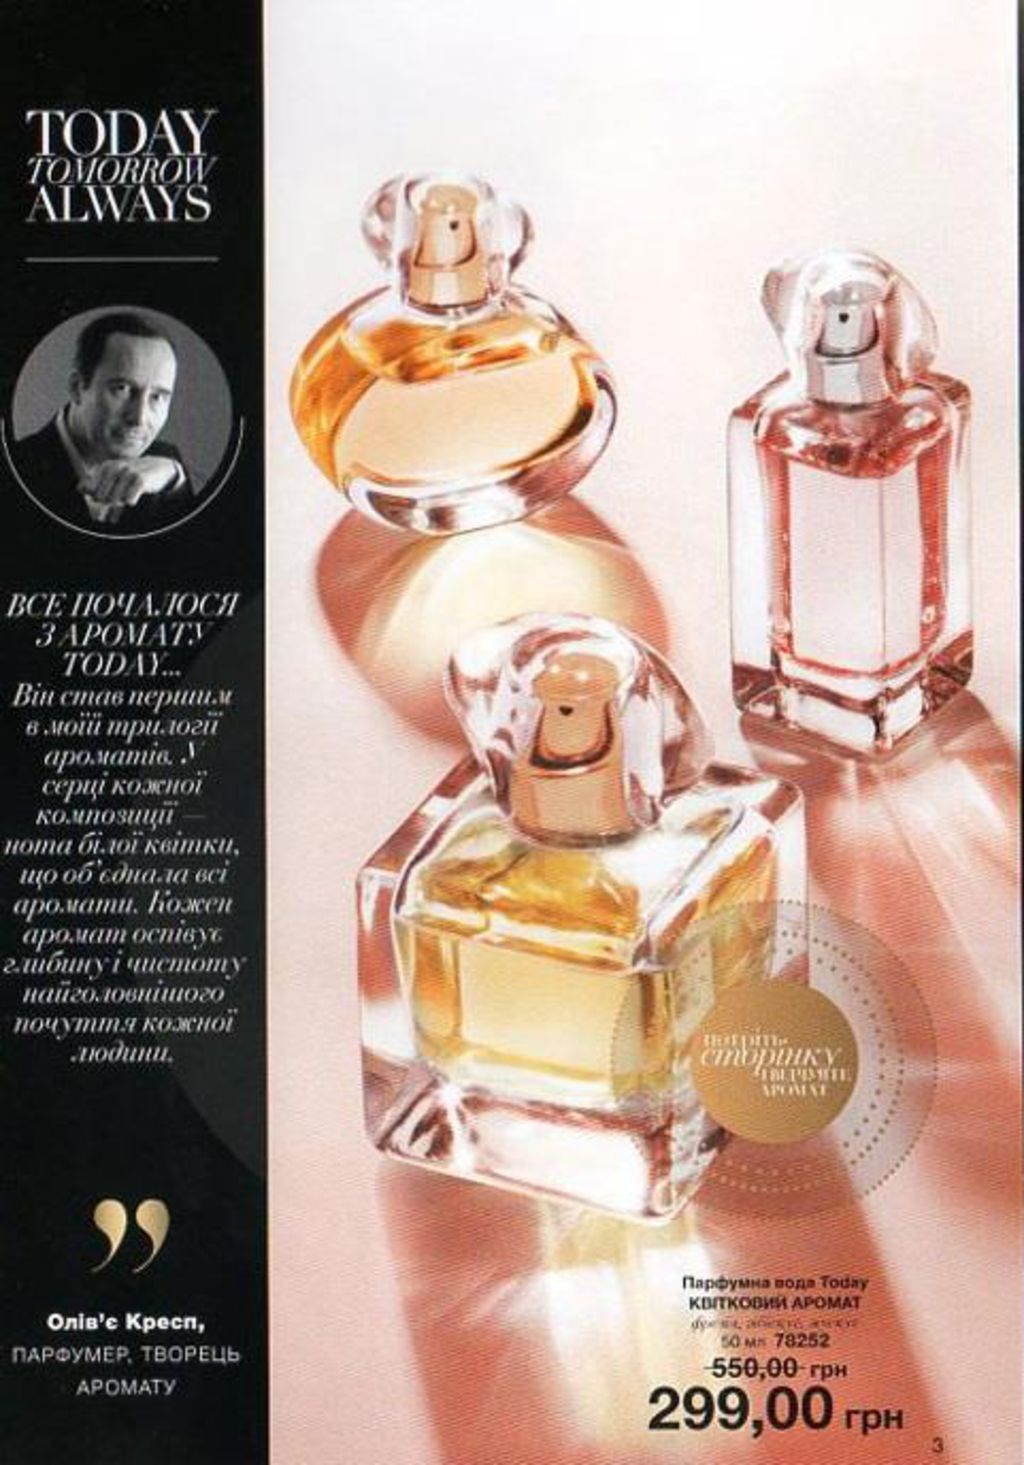 Парфюмерия эйвон каталог цен косметика премиум купить интернет магазин